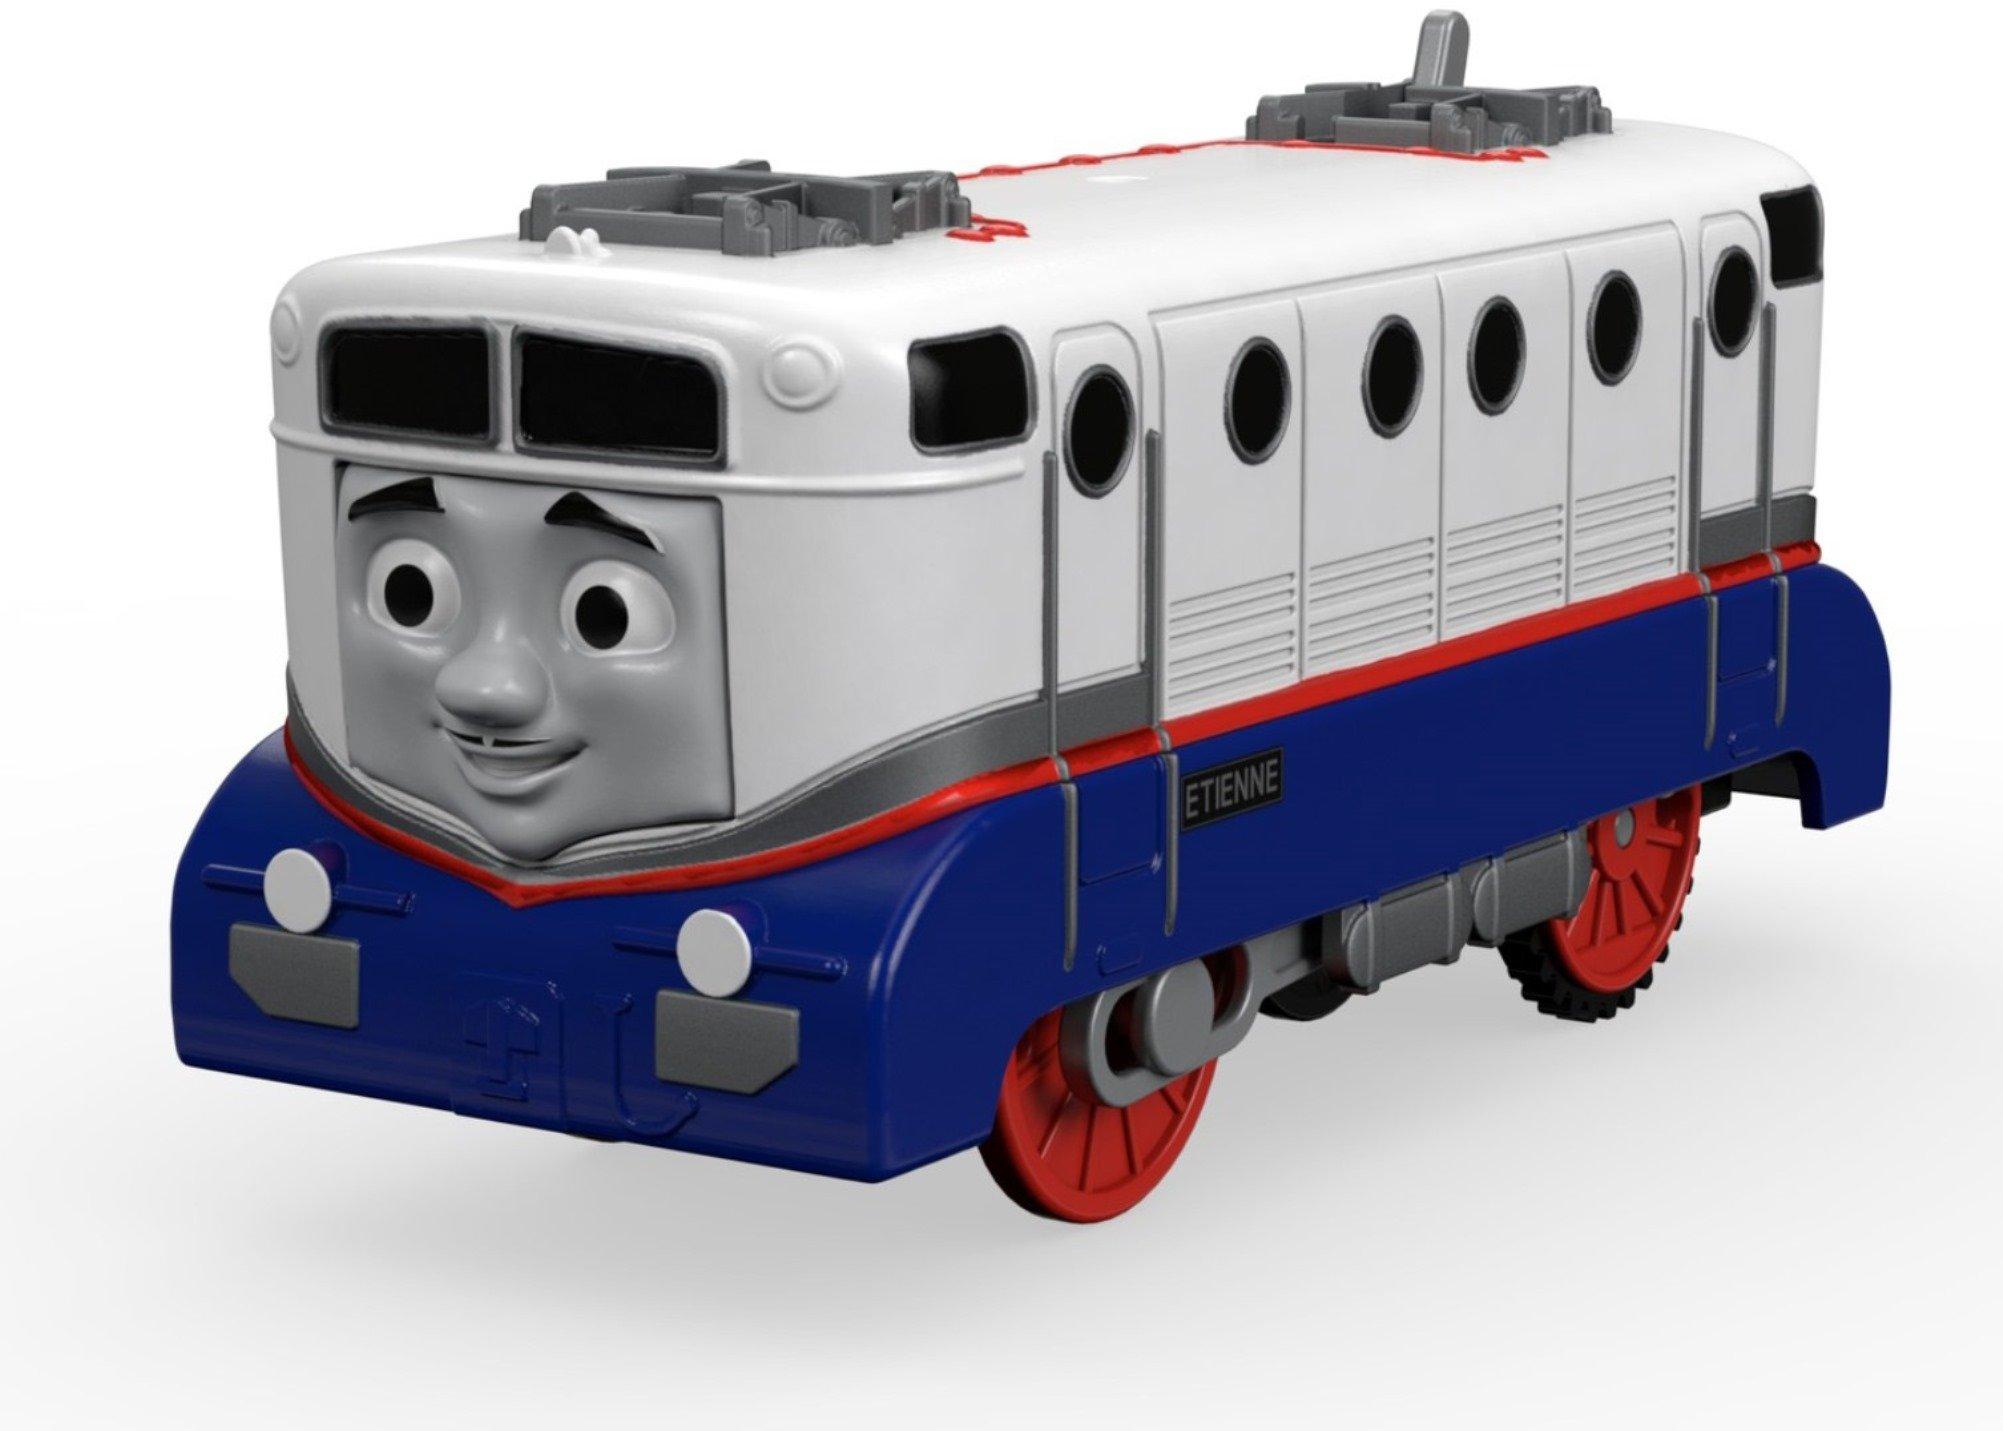 Thomas & Friends Fisher-Price TrackMaster, Etienne Train